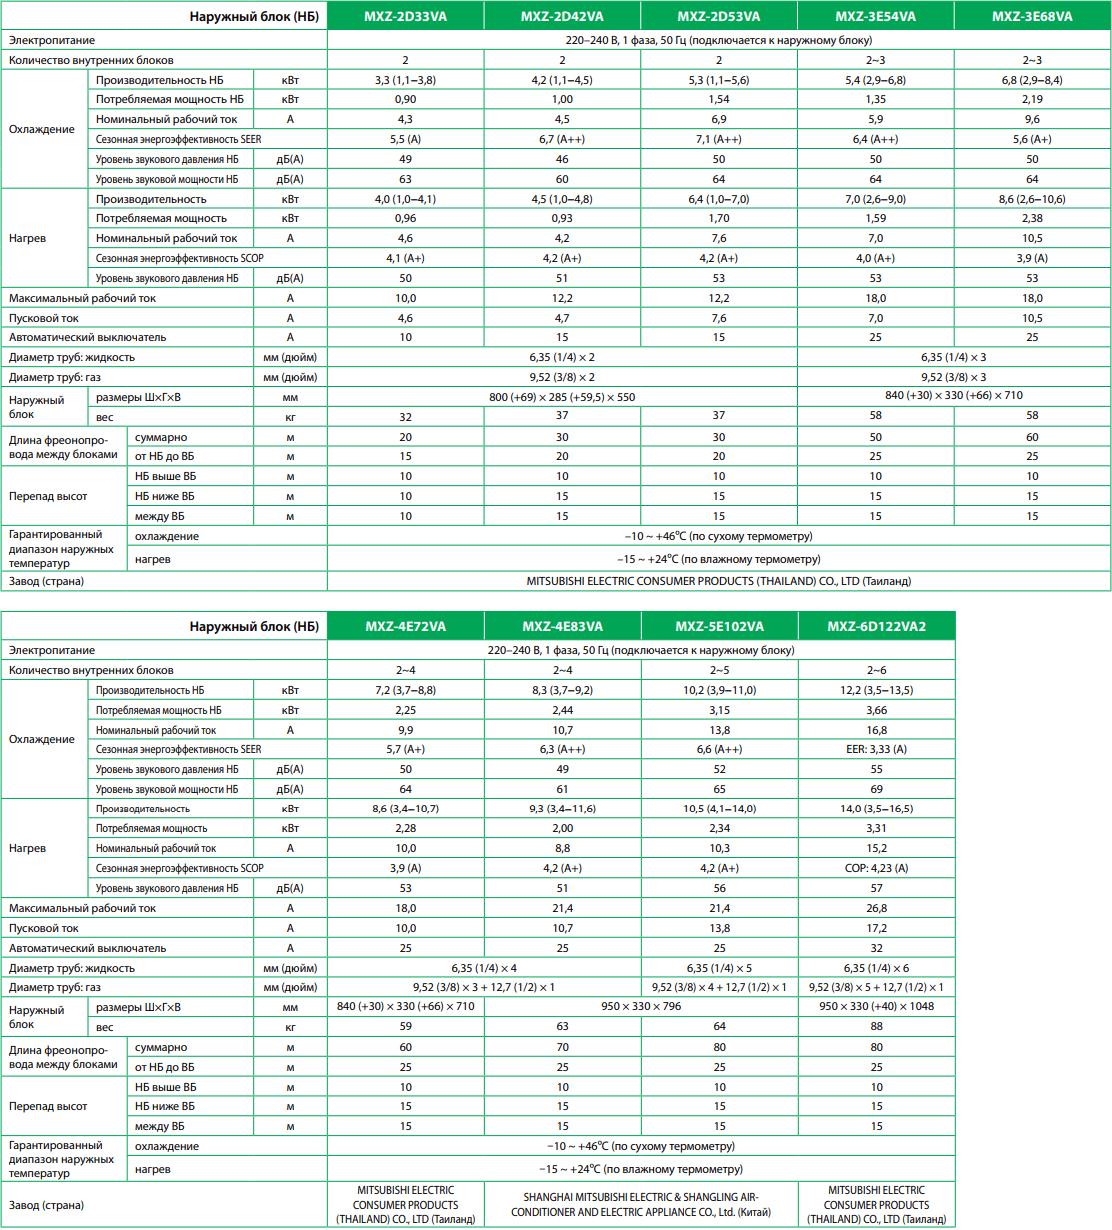 Наружный блок Mitsubishi Electric MXZ-VA - Характеристики